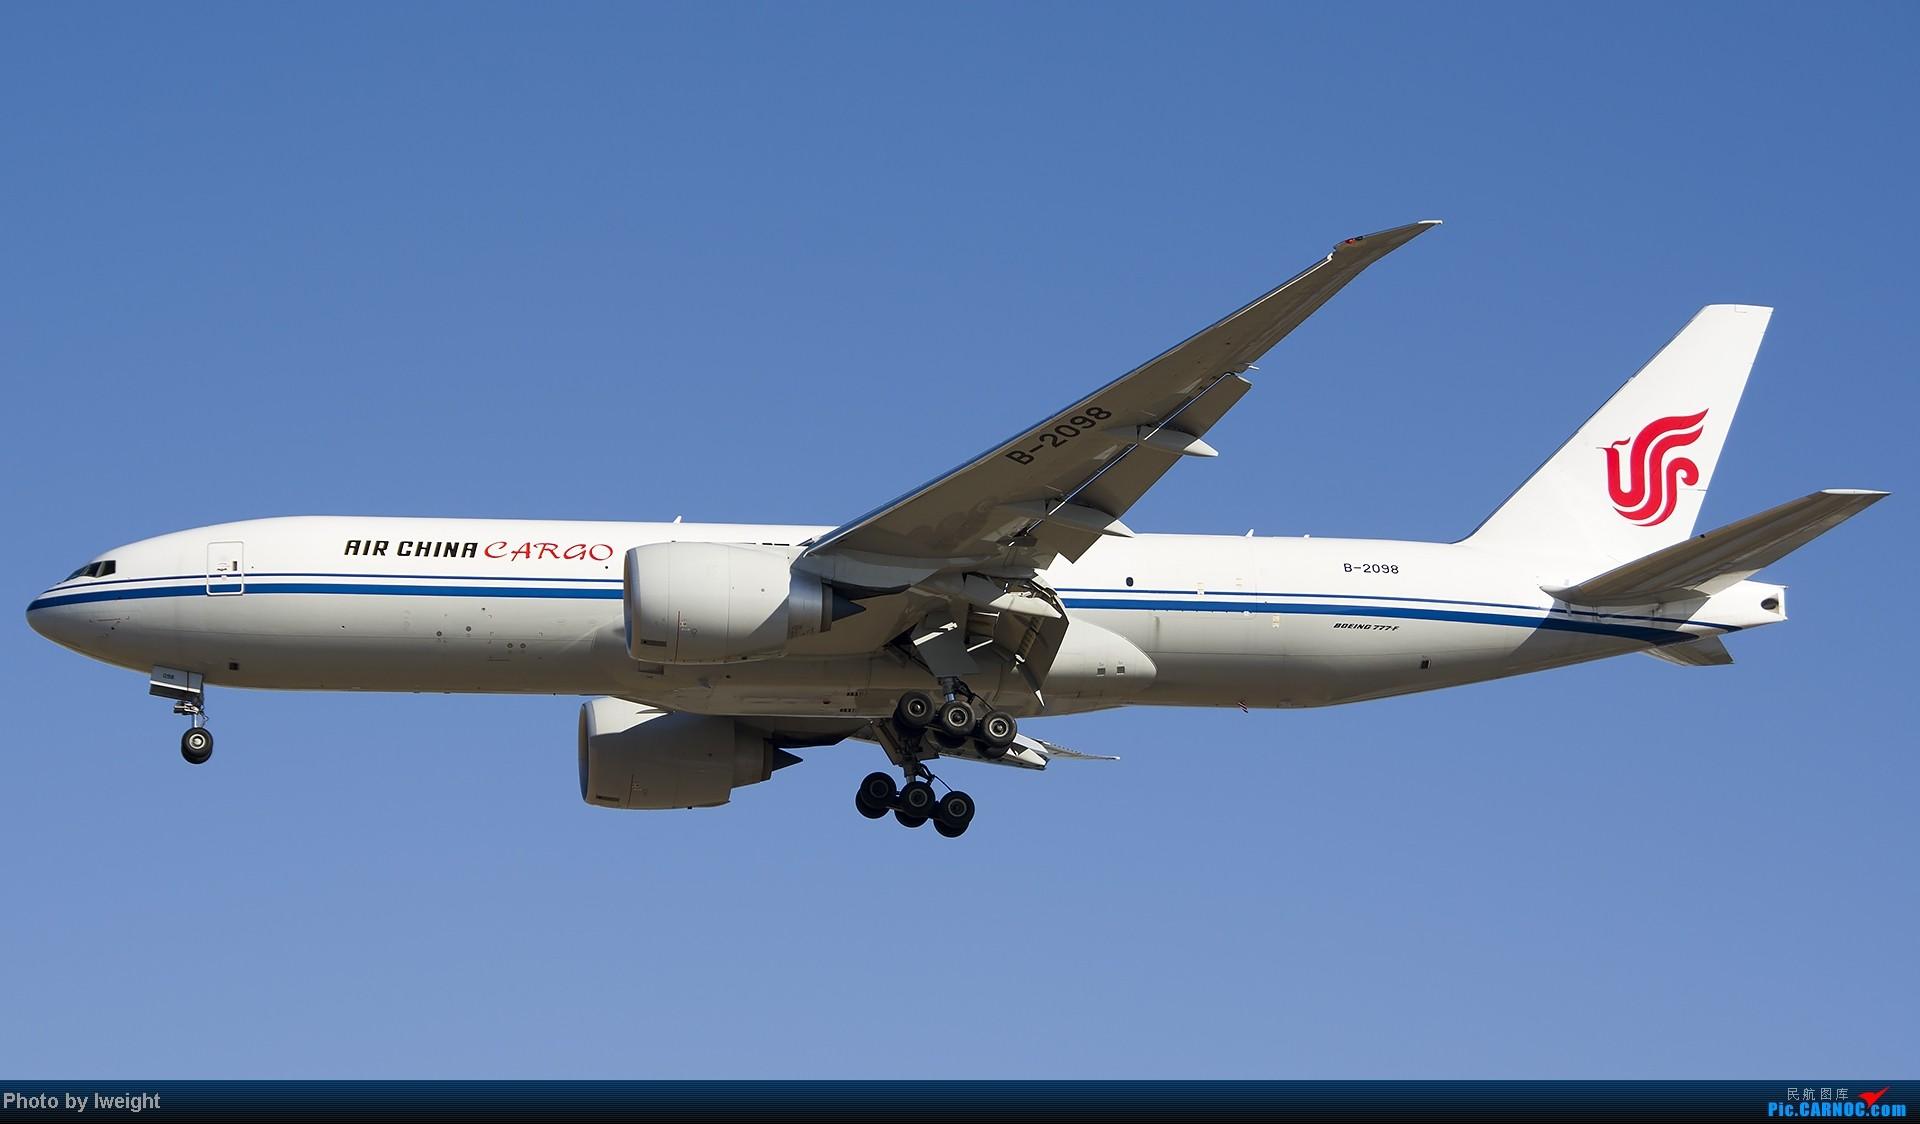 Re:[原创]抓住APEC蓝的尾巴,再拍上一组 BOEING 777-200 B-2098 中国北京首都机场